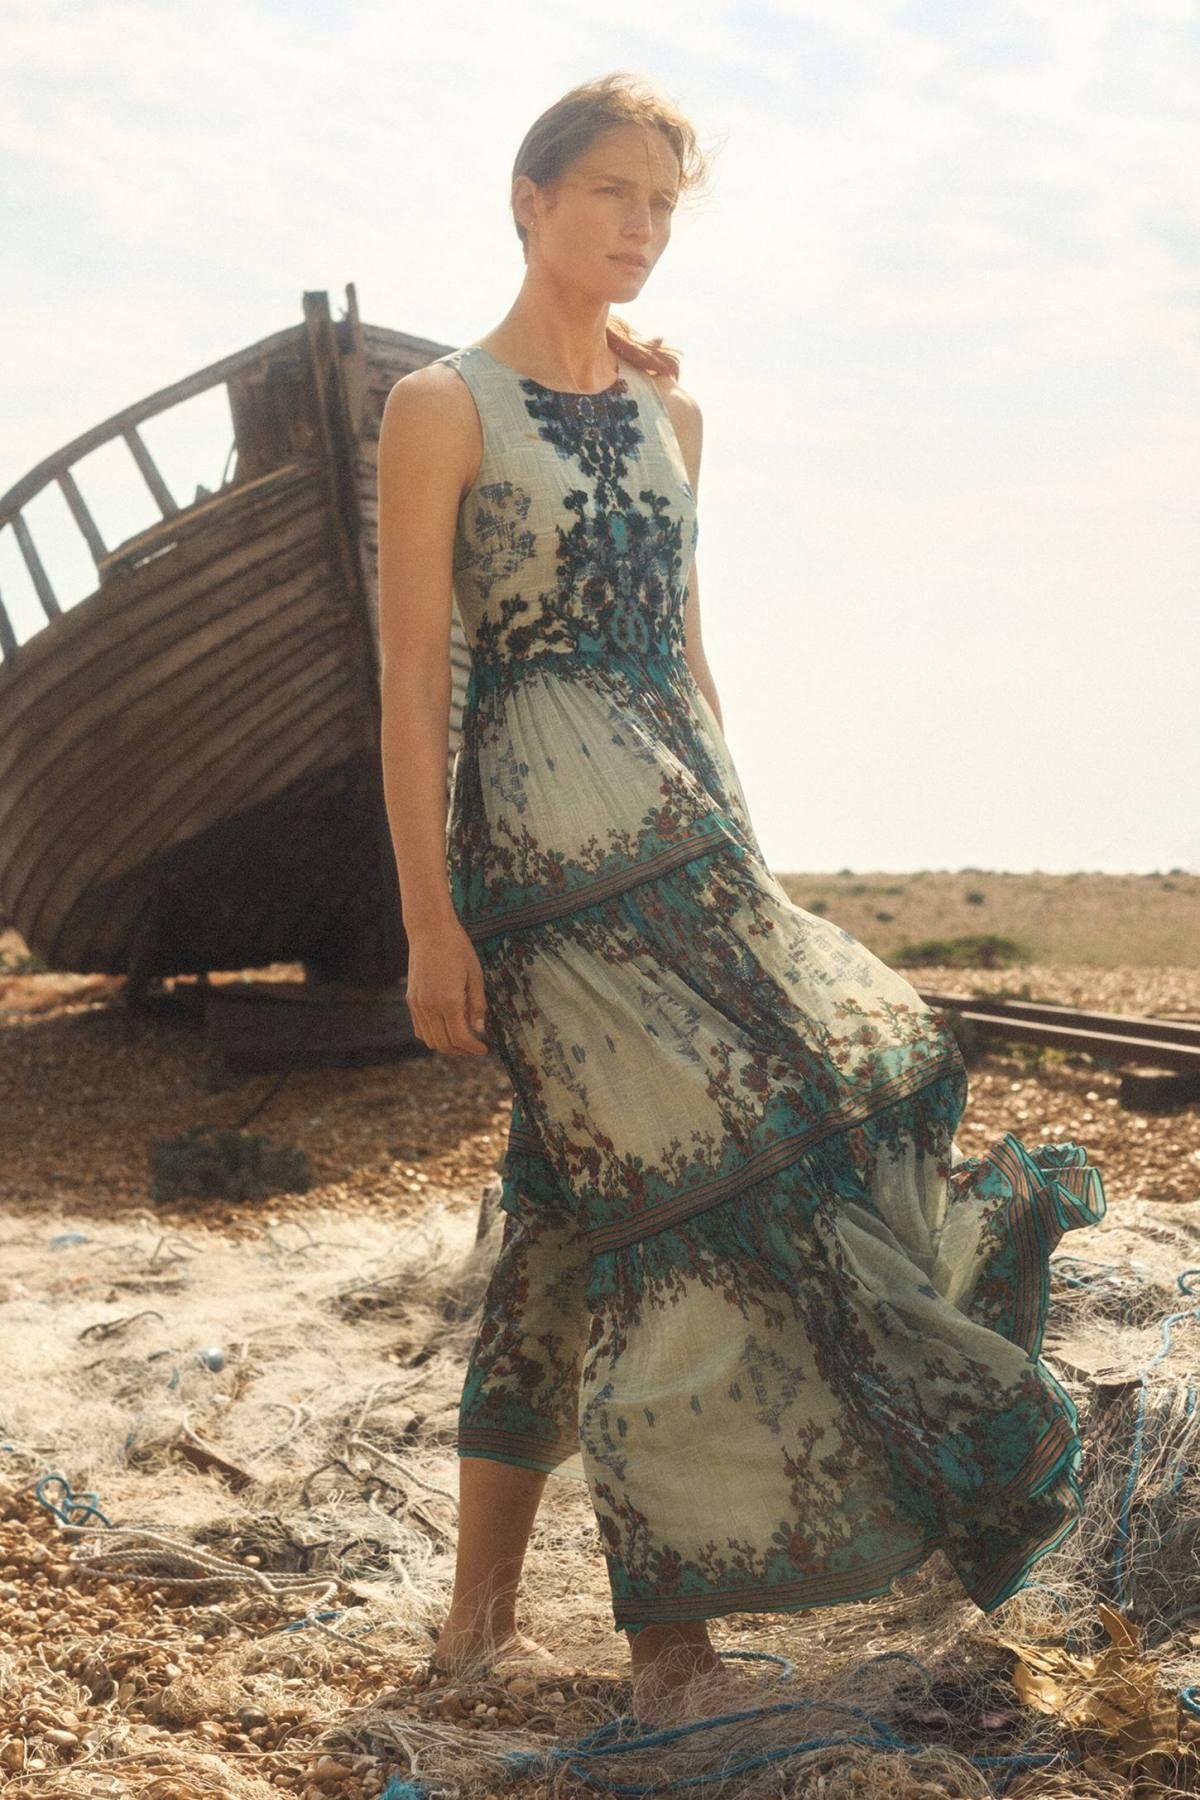 5c4aeb783fe1 The Madera Maxi Dress, Anthropologie theboxfiles.com | OOOH, PRETTY ...